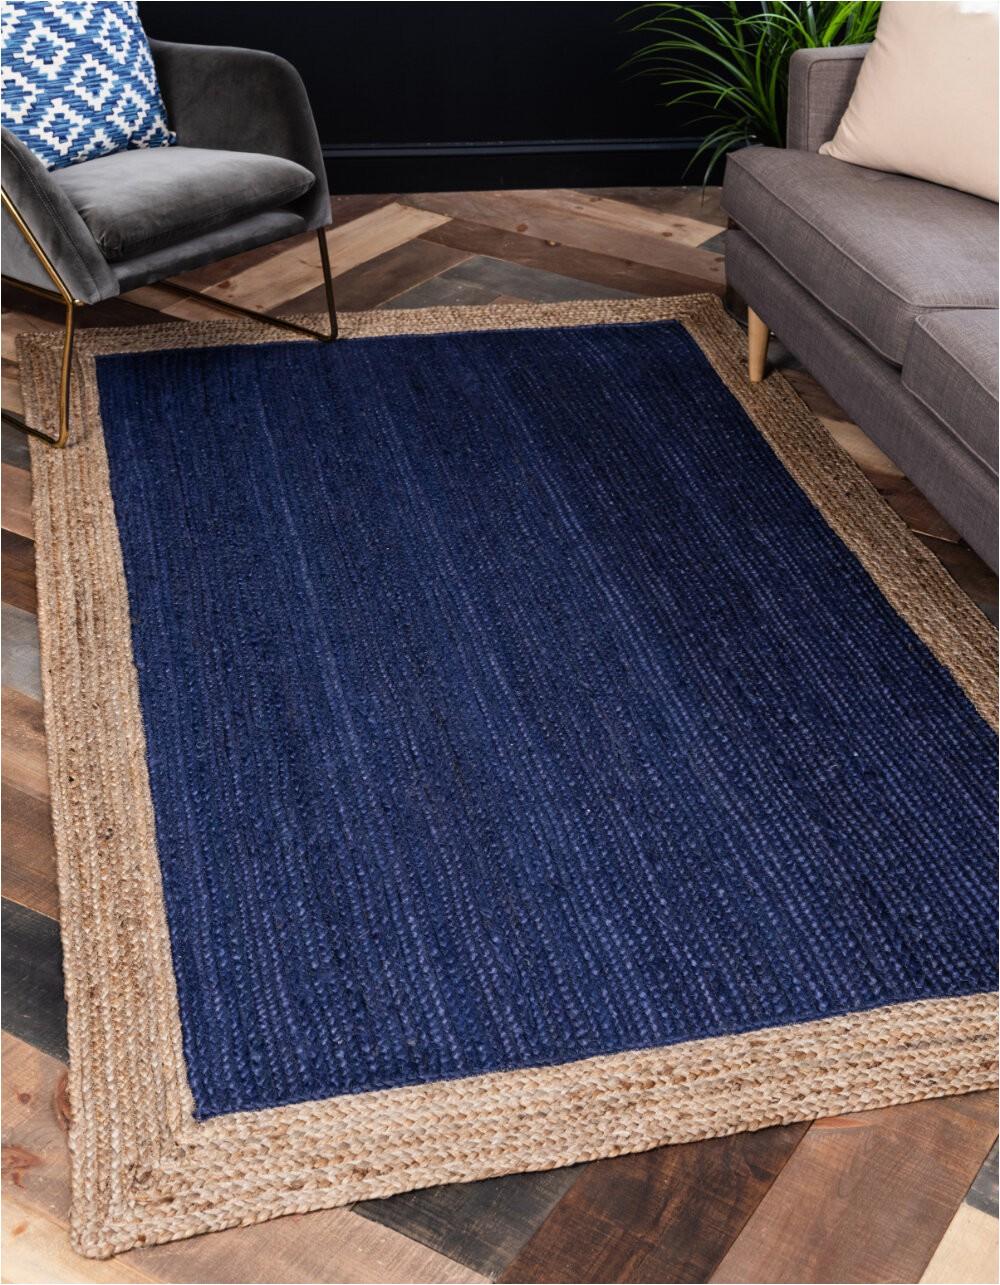 niagara hand braided navy bluebrown area rug